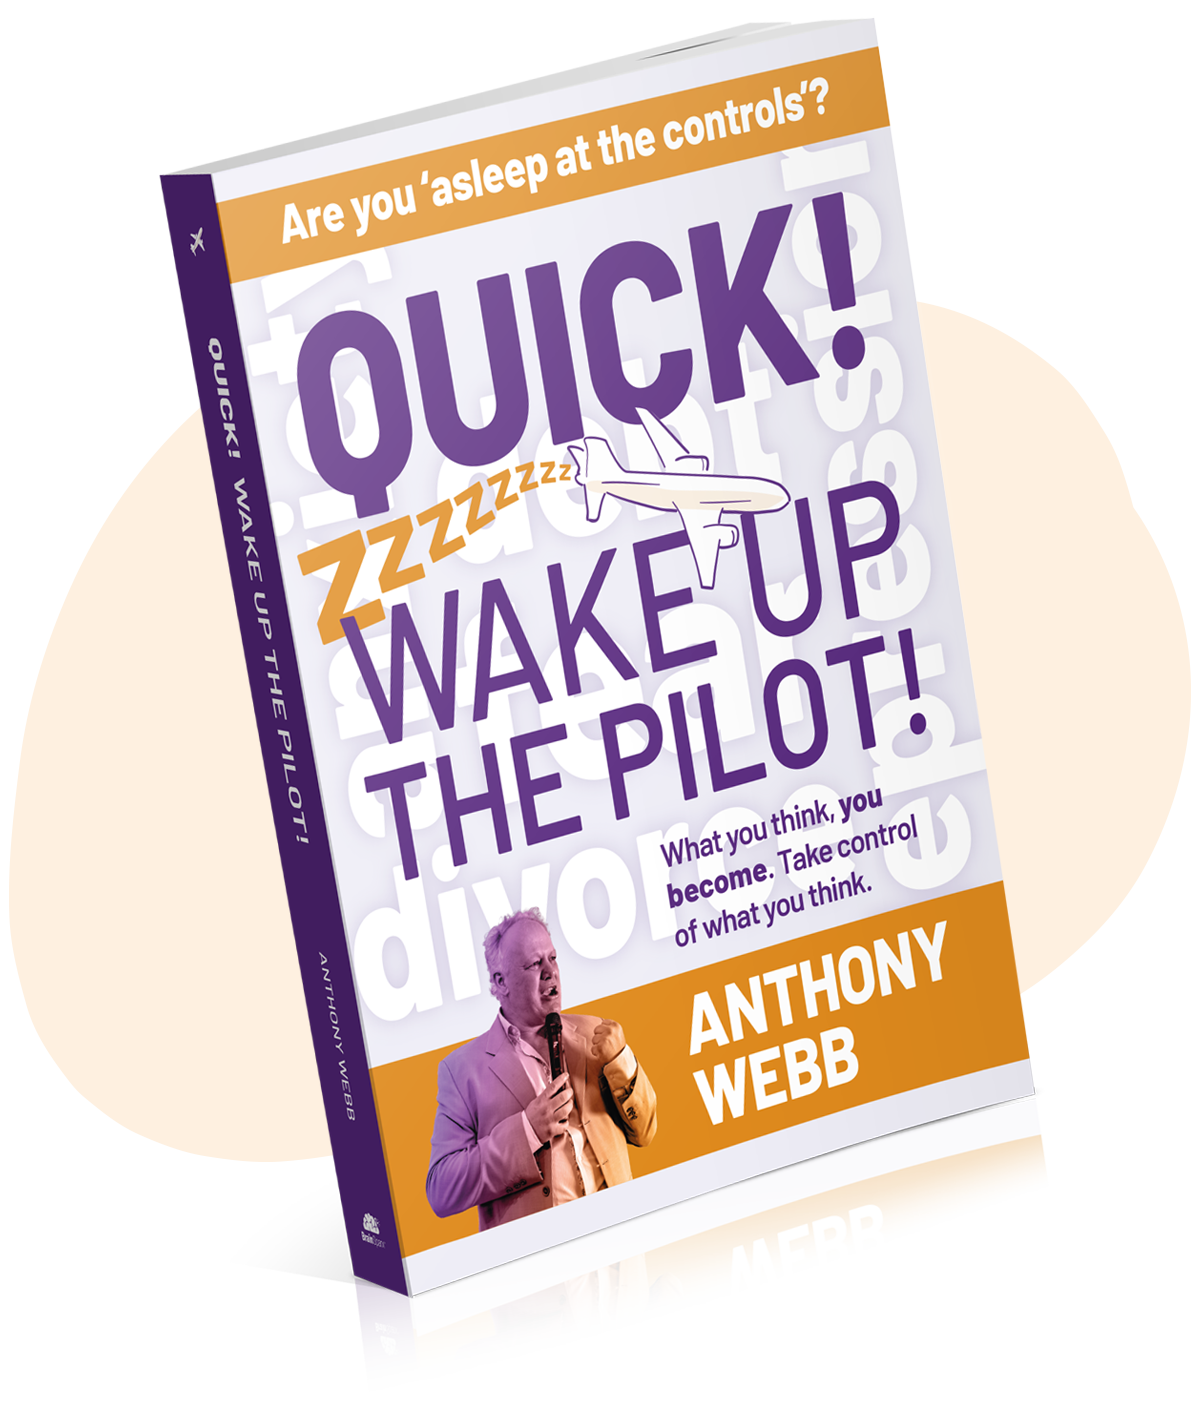 Quick! Wake up the Pilot!